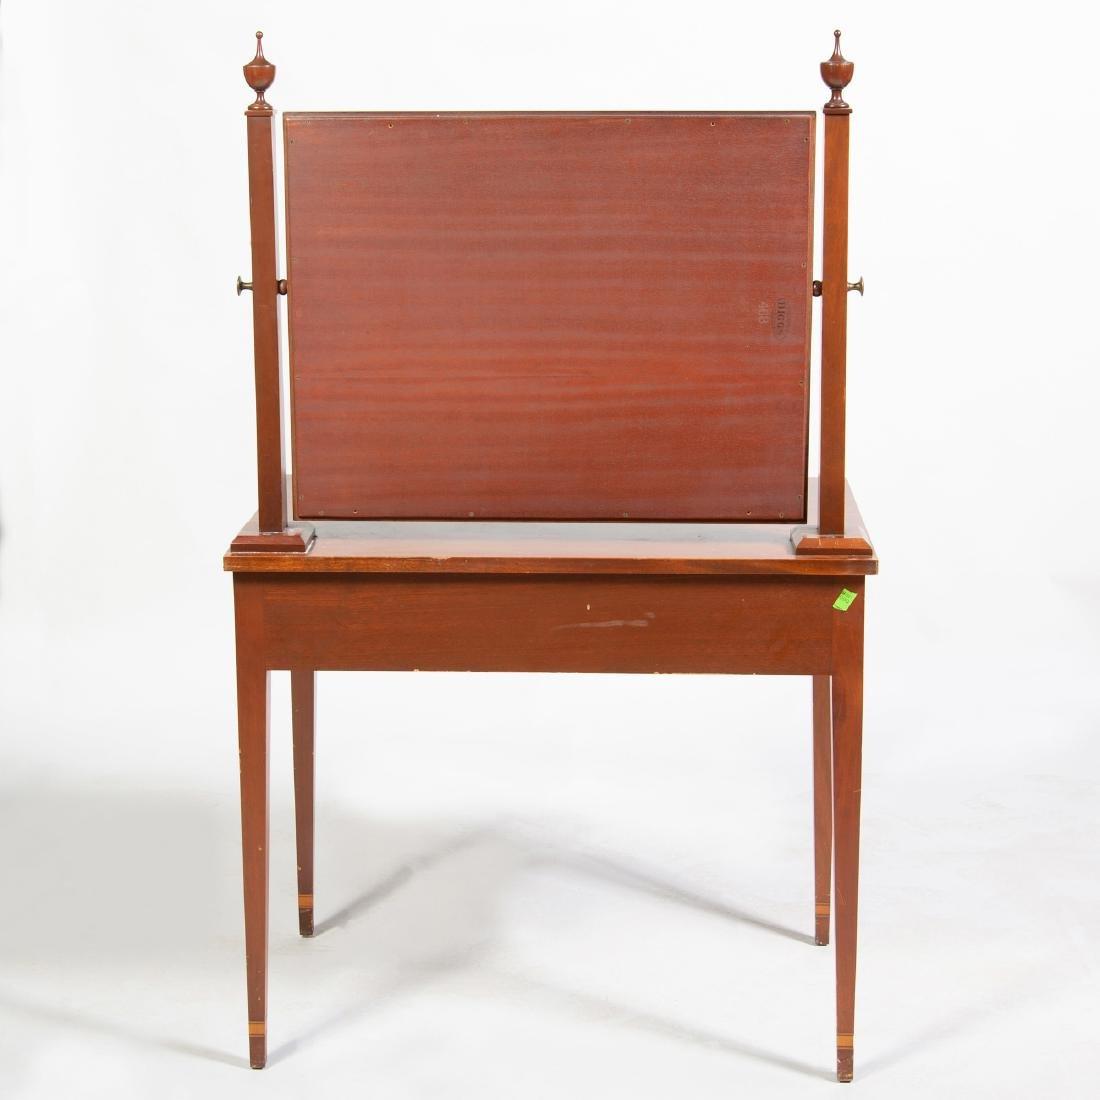 George III Style Inlaid Mahogany Dressing Table - 2